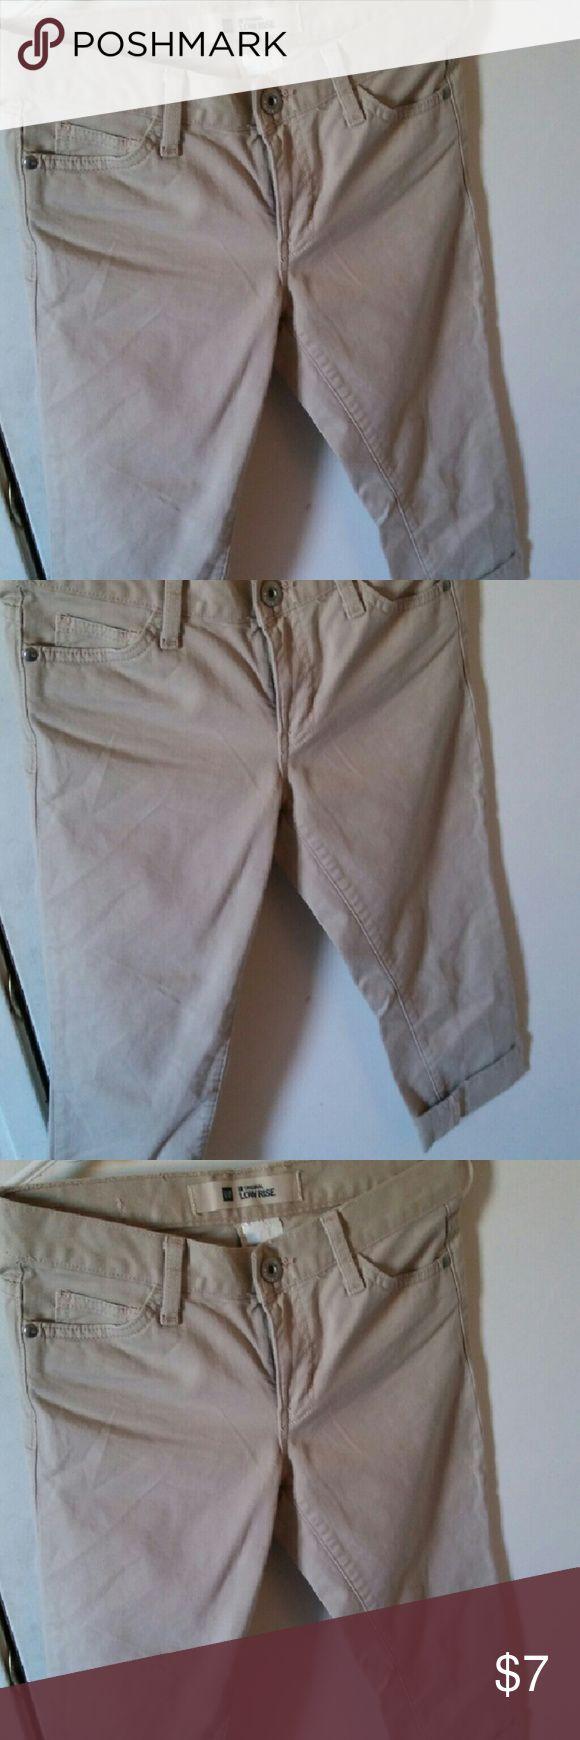 Gap crop low rise BEIGE Jeans Low rise  Crop Beige Size 2 R Gap Jeans Ankle & Cropped